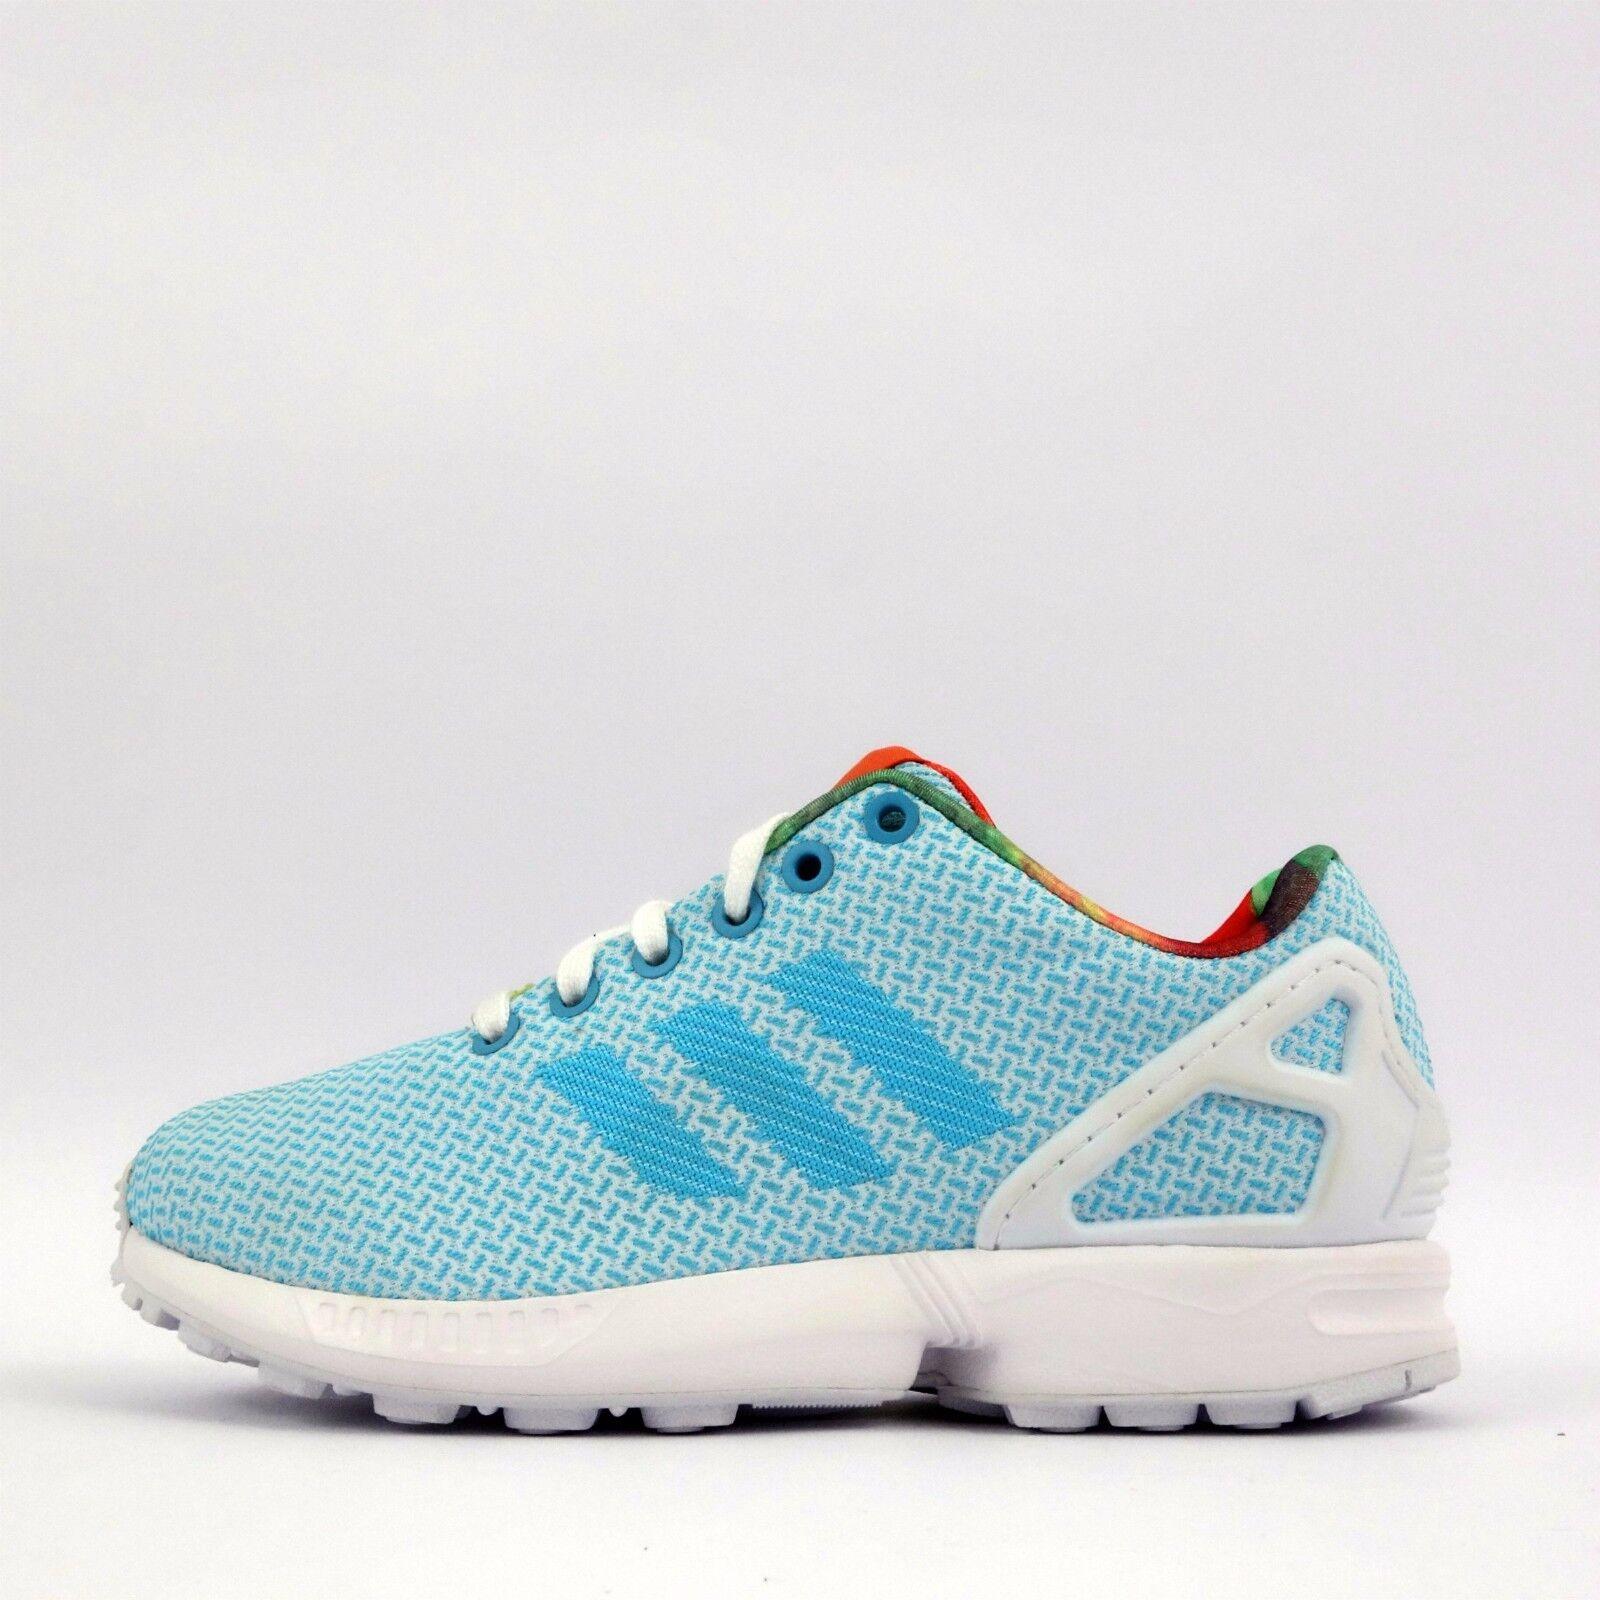 Adidas Originali flusso di ZX tessere Scarpe Sportive Da Donna Aqua